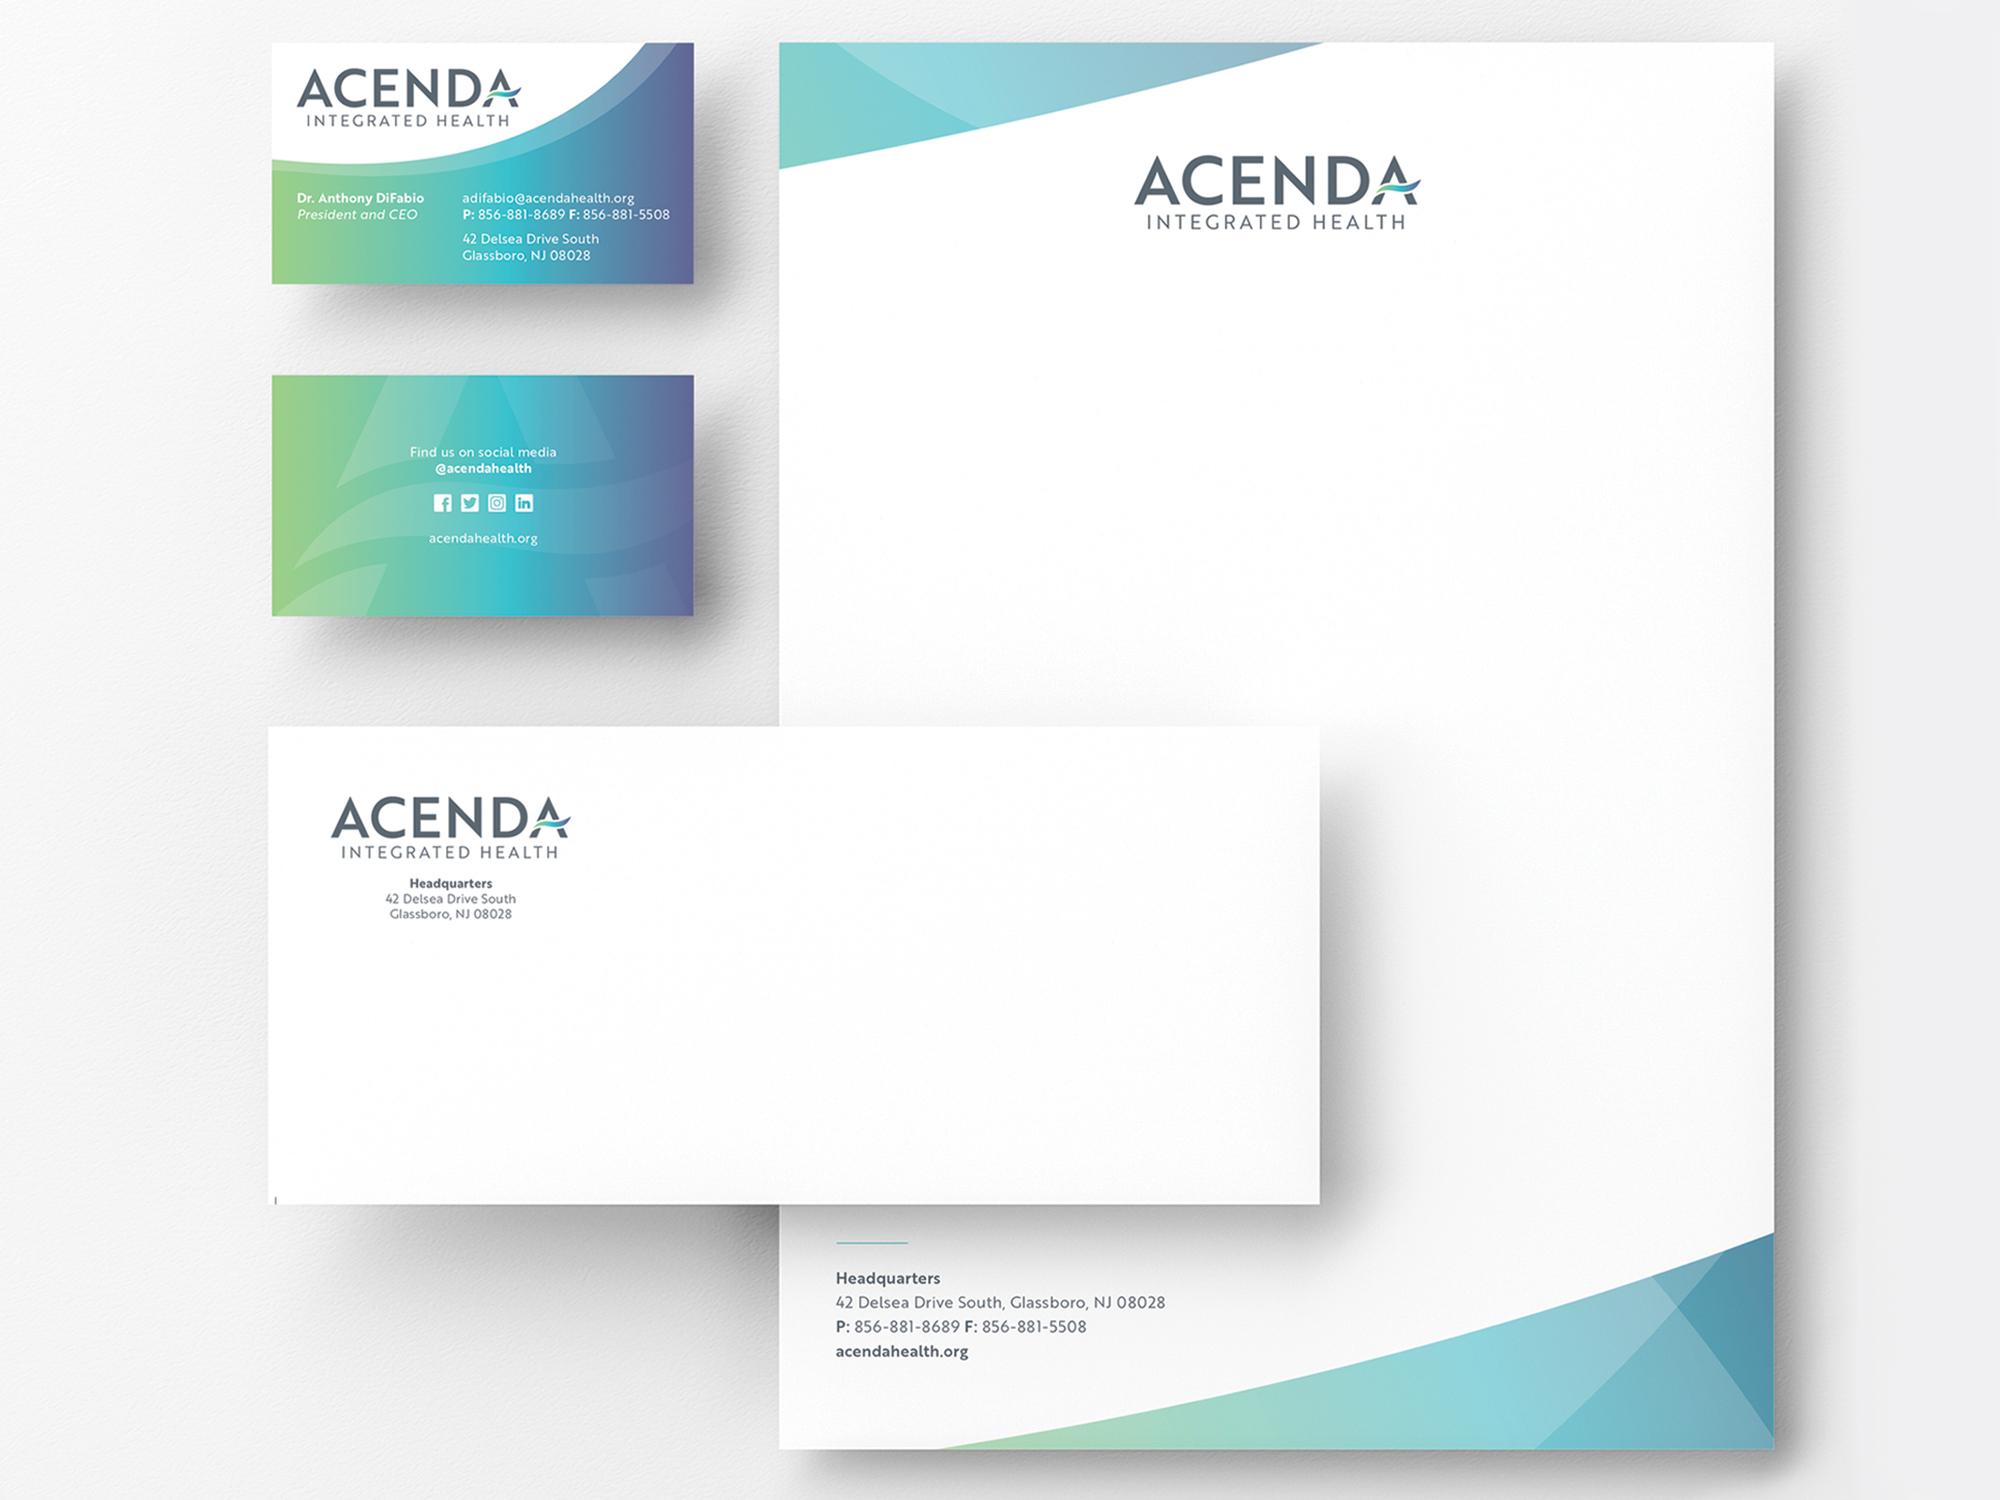 acenda-stationary